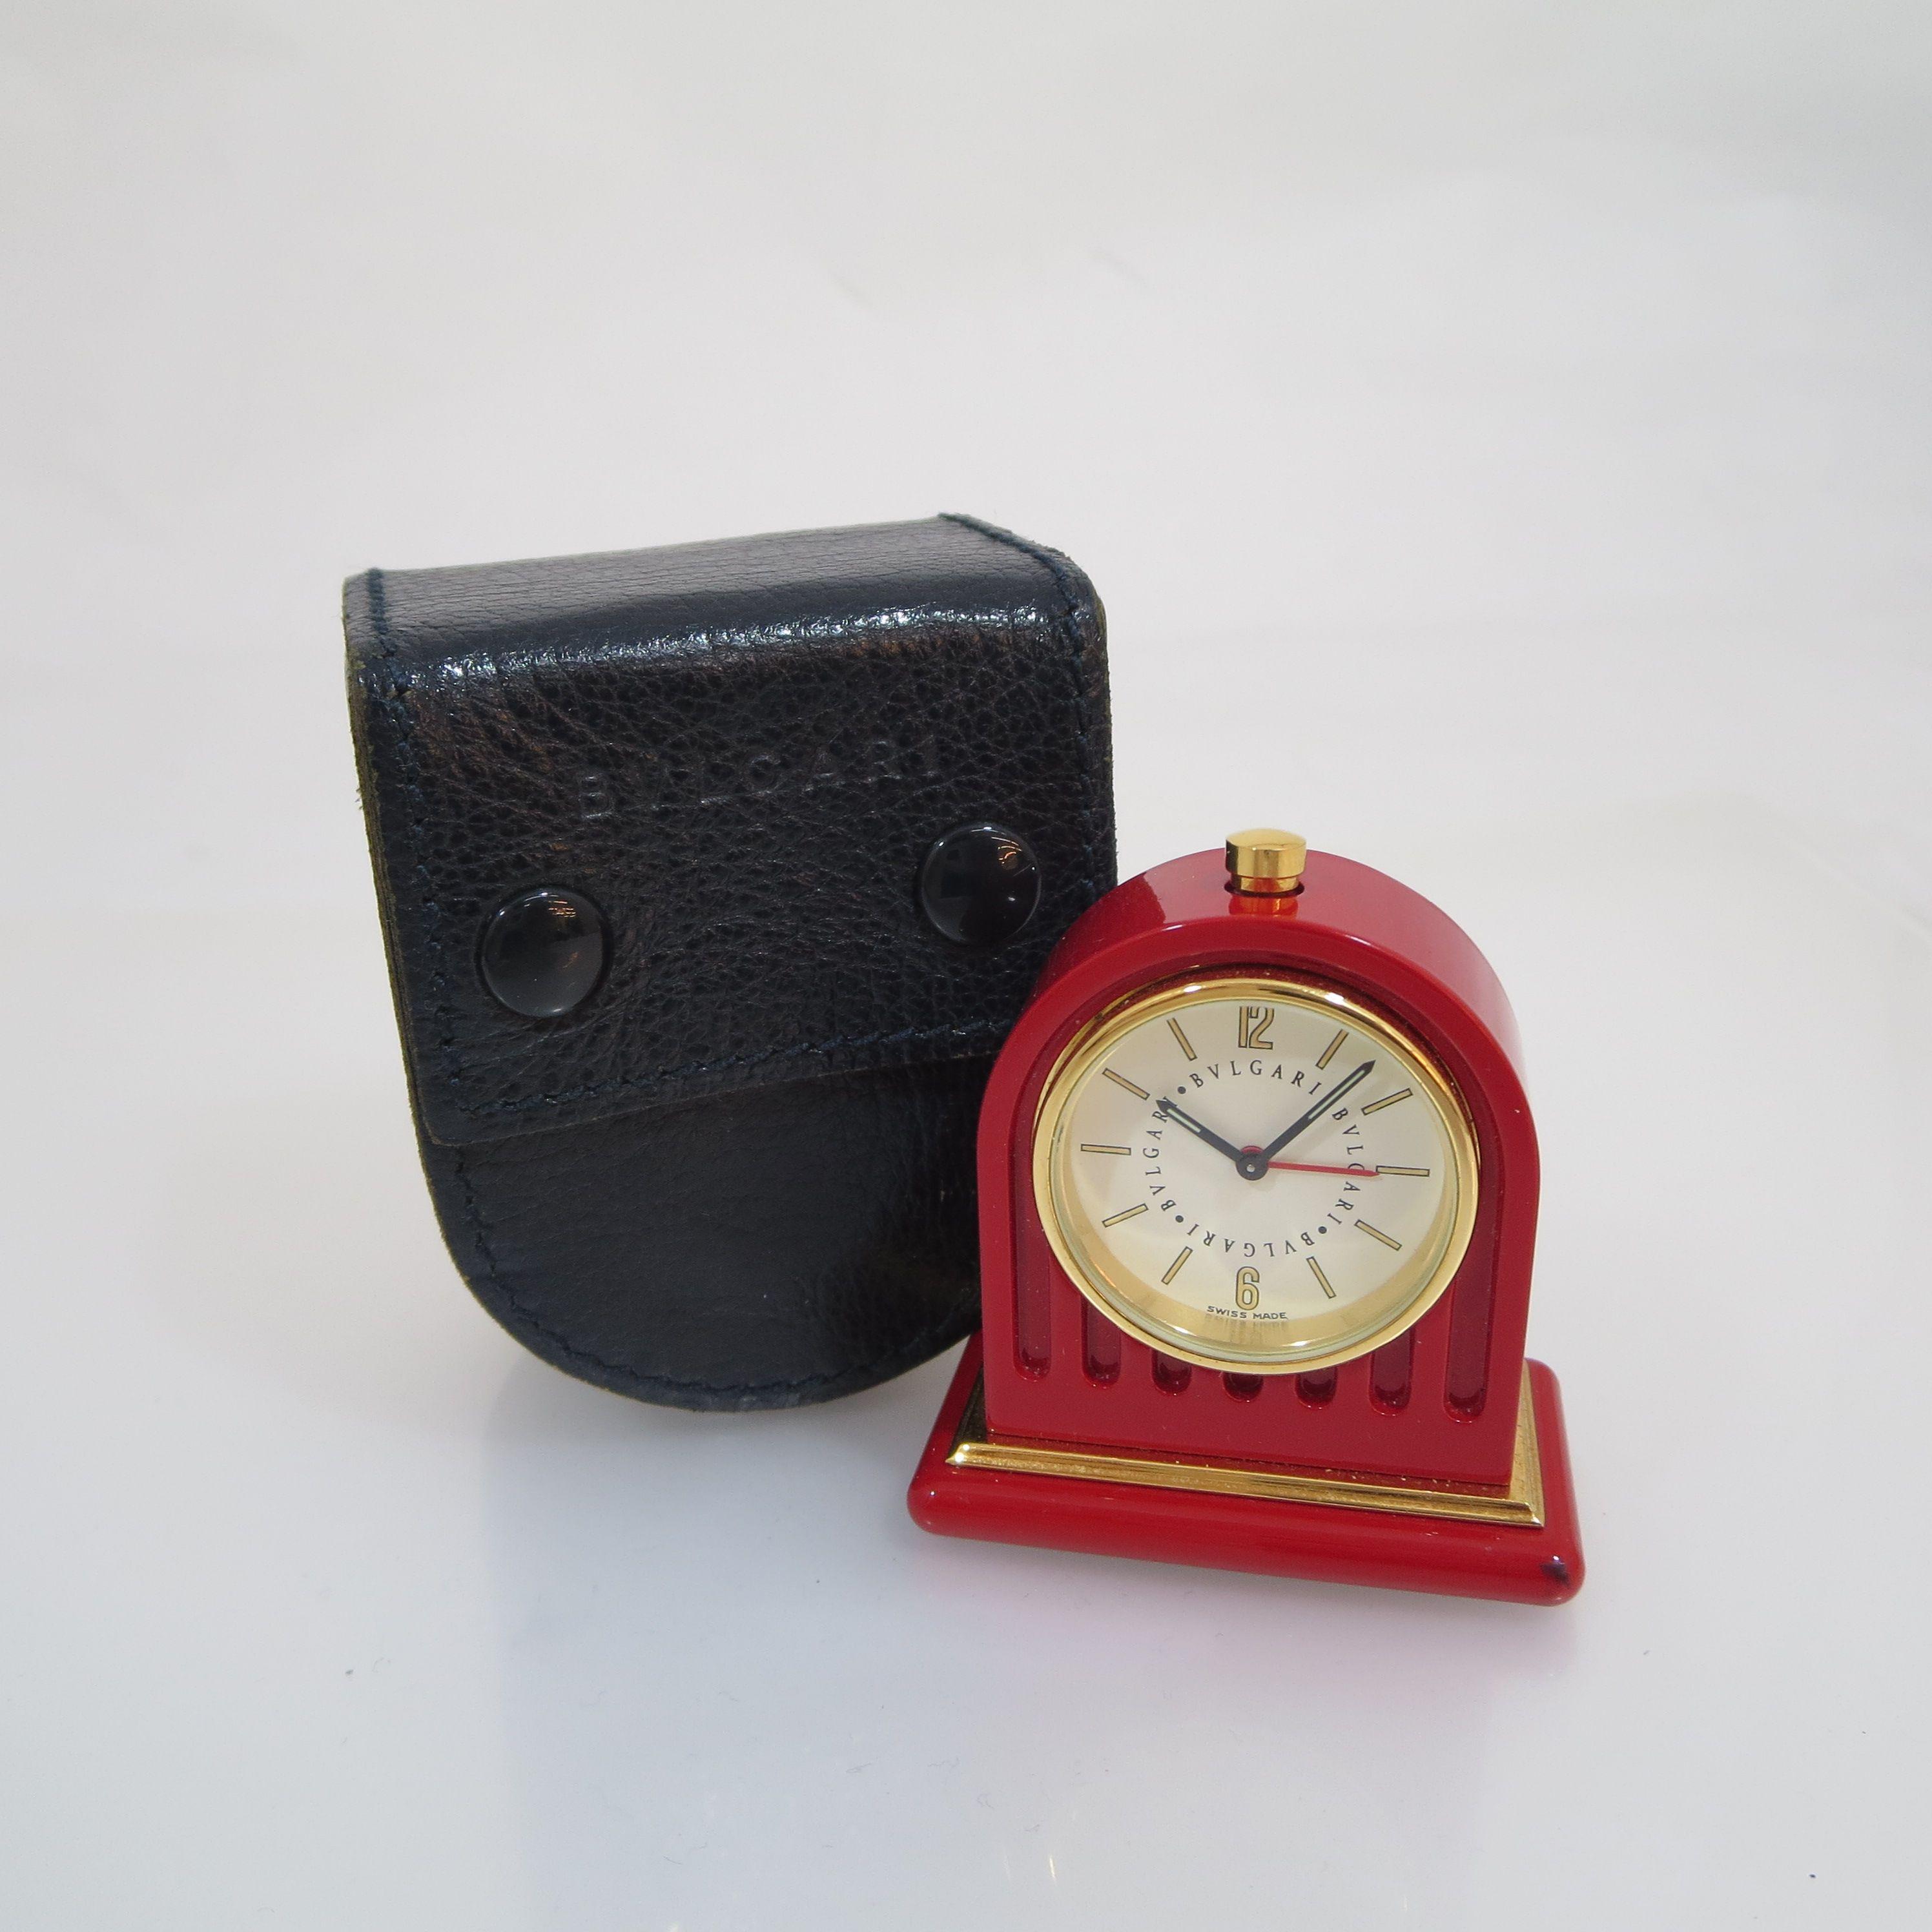 info for f4b60 cedc5 ブルガリ 置時計お買取させていただきました。エブリデイ ...